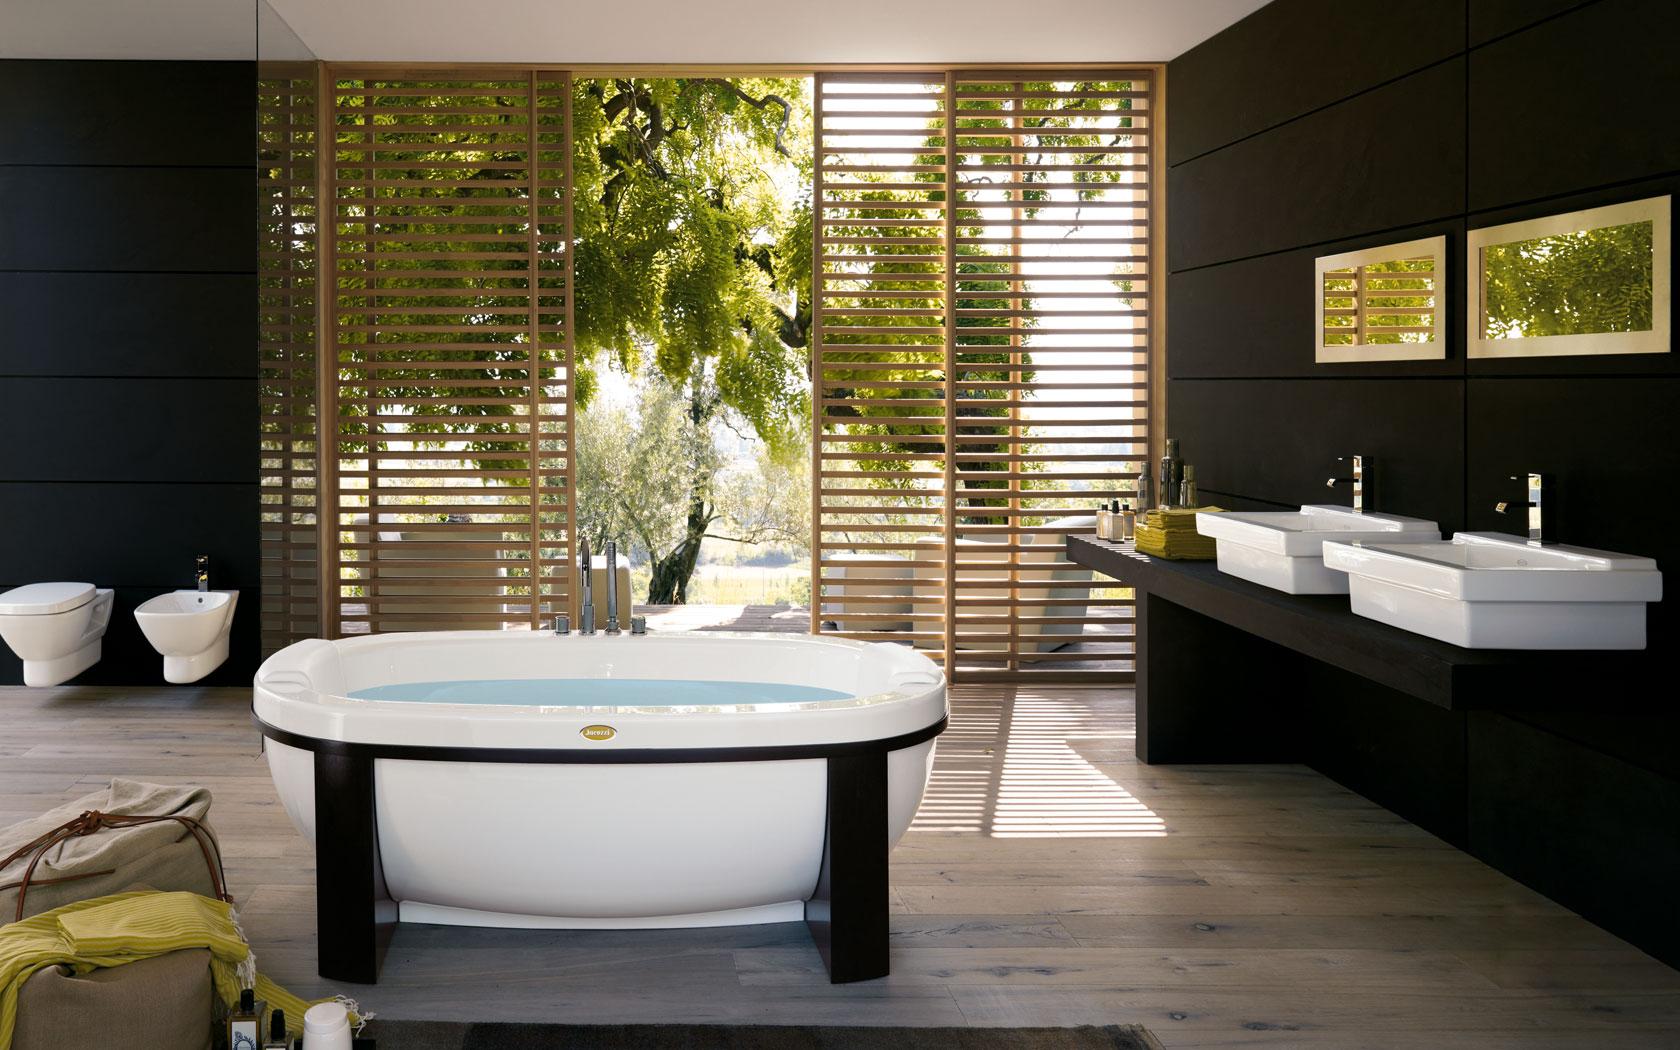 Bathroom with jacuzzi bathrooms with jacuzzi designs small for Jacuzzi bathroom designs